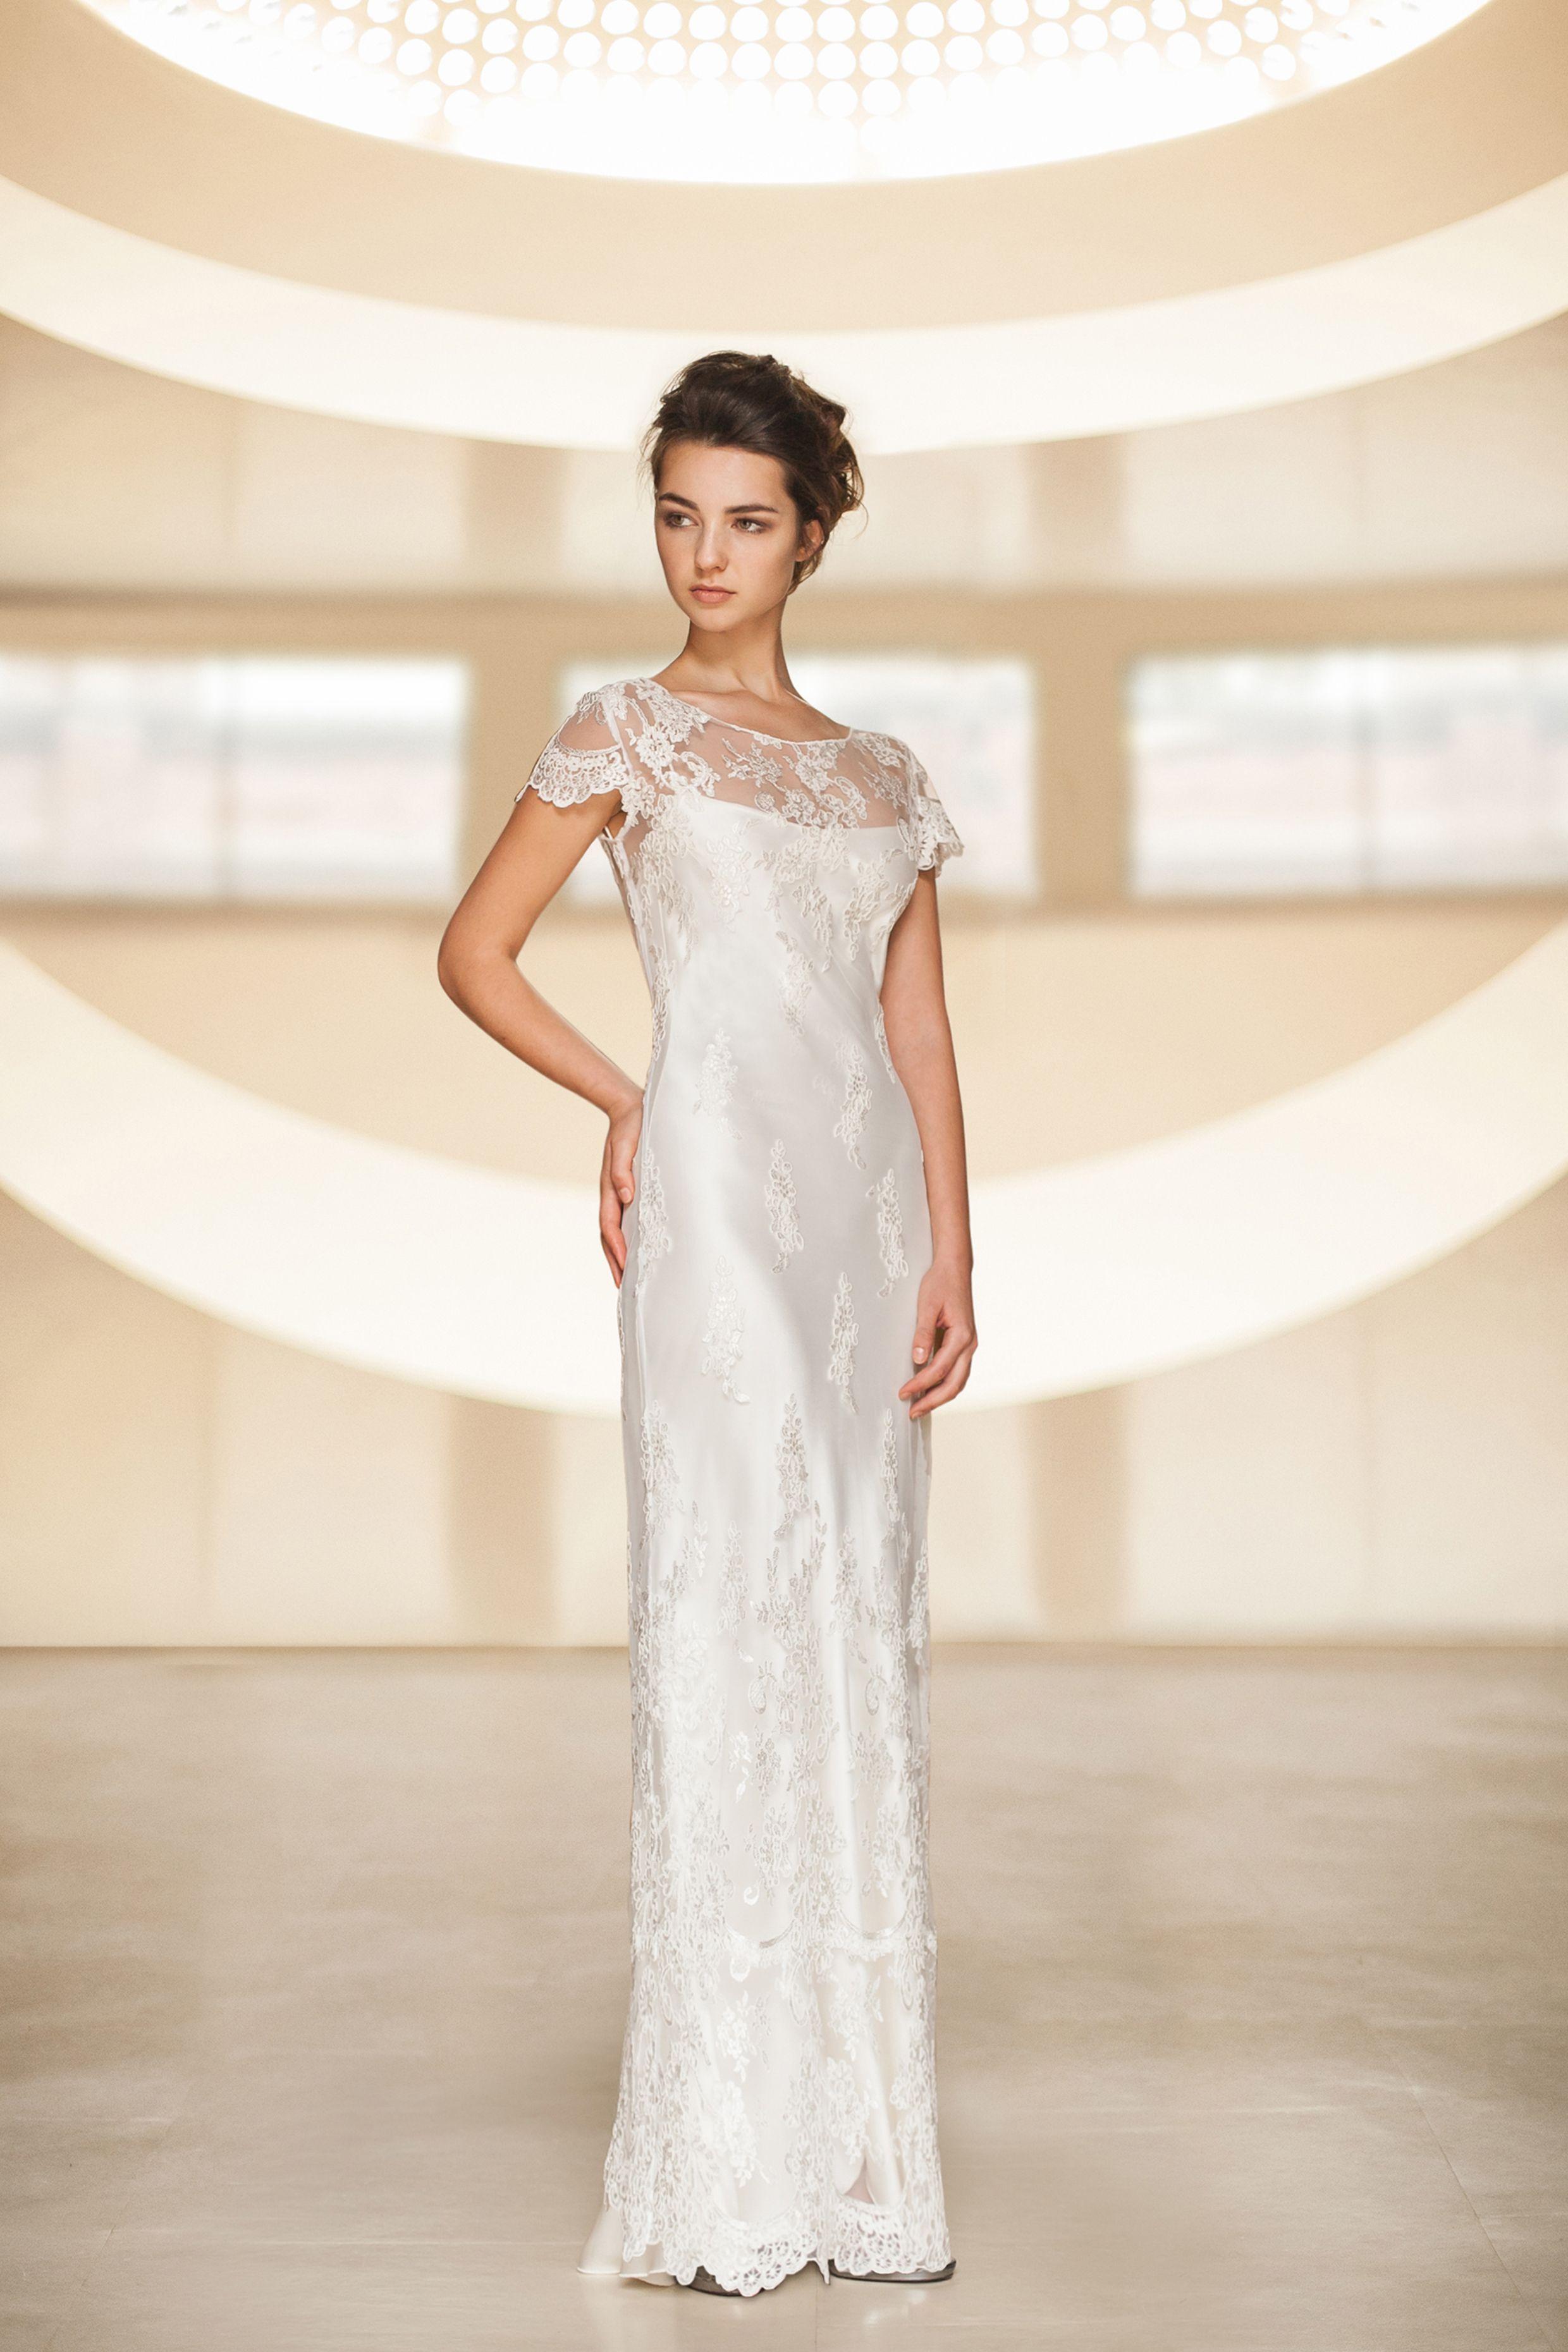 Lace dress styles for funeral  Amanda Garrett  Wedding Dress Shopping  Pinterest  Wedding dress